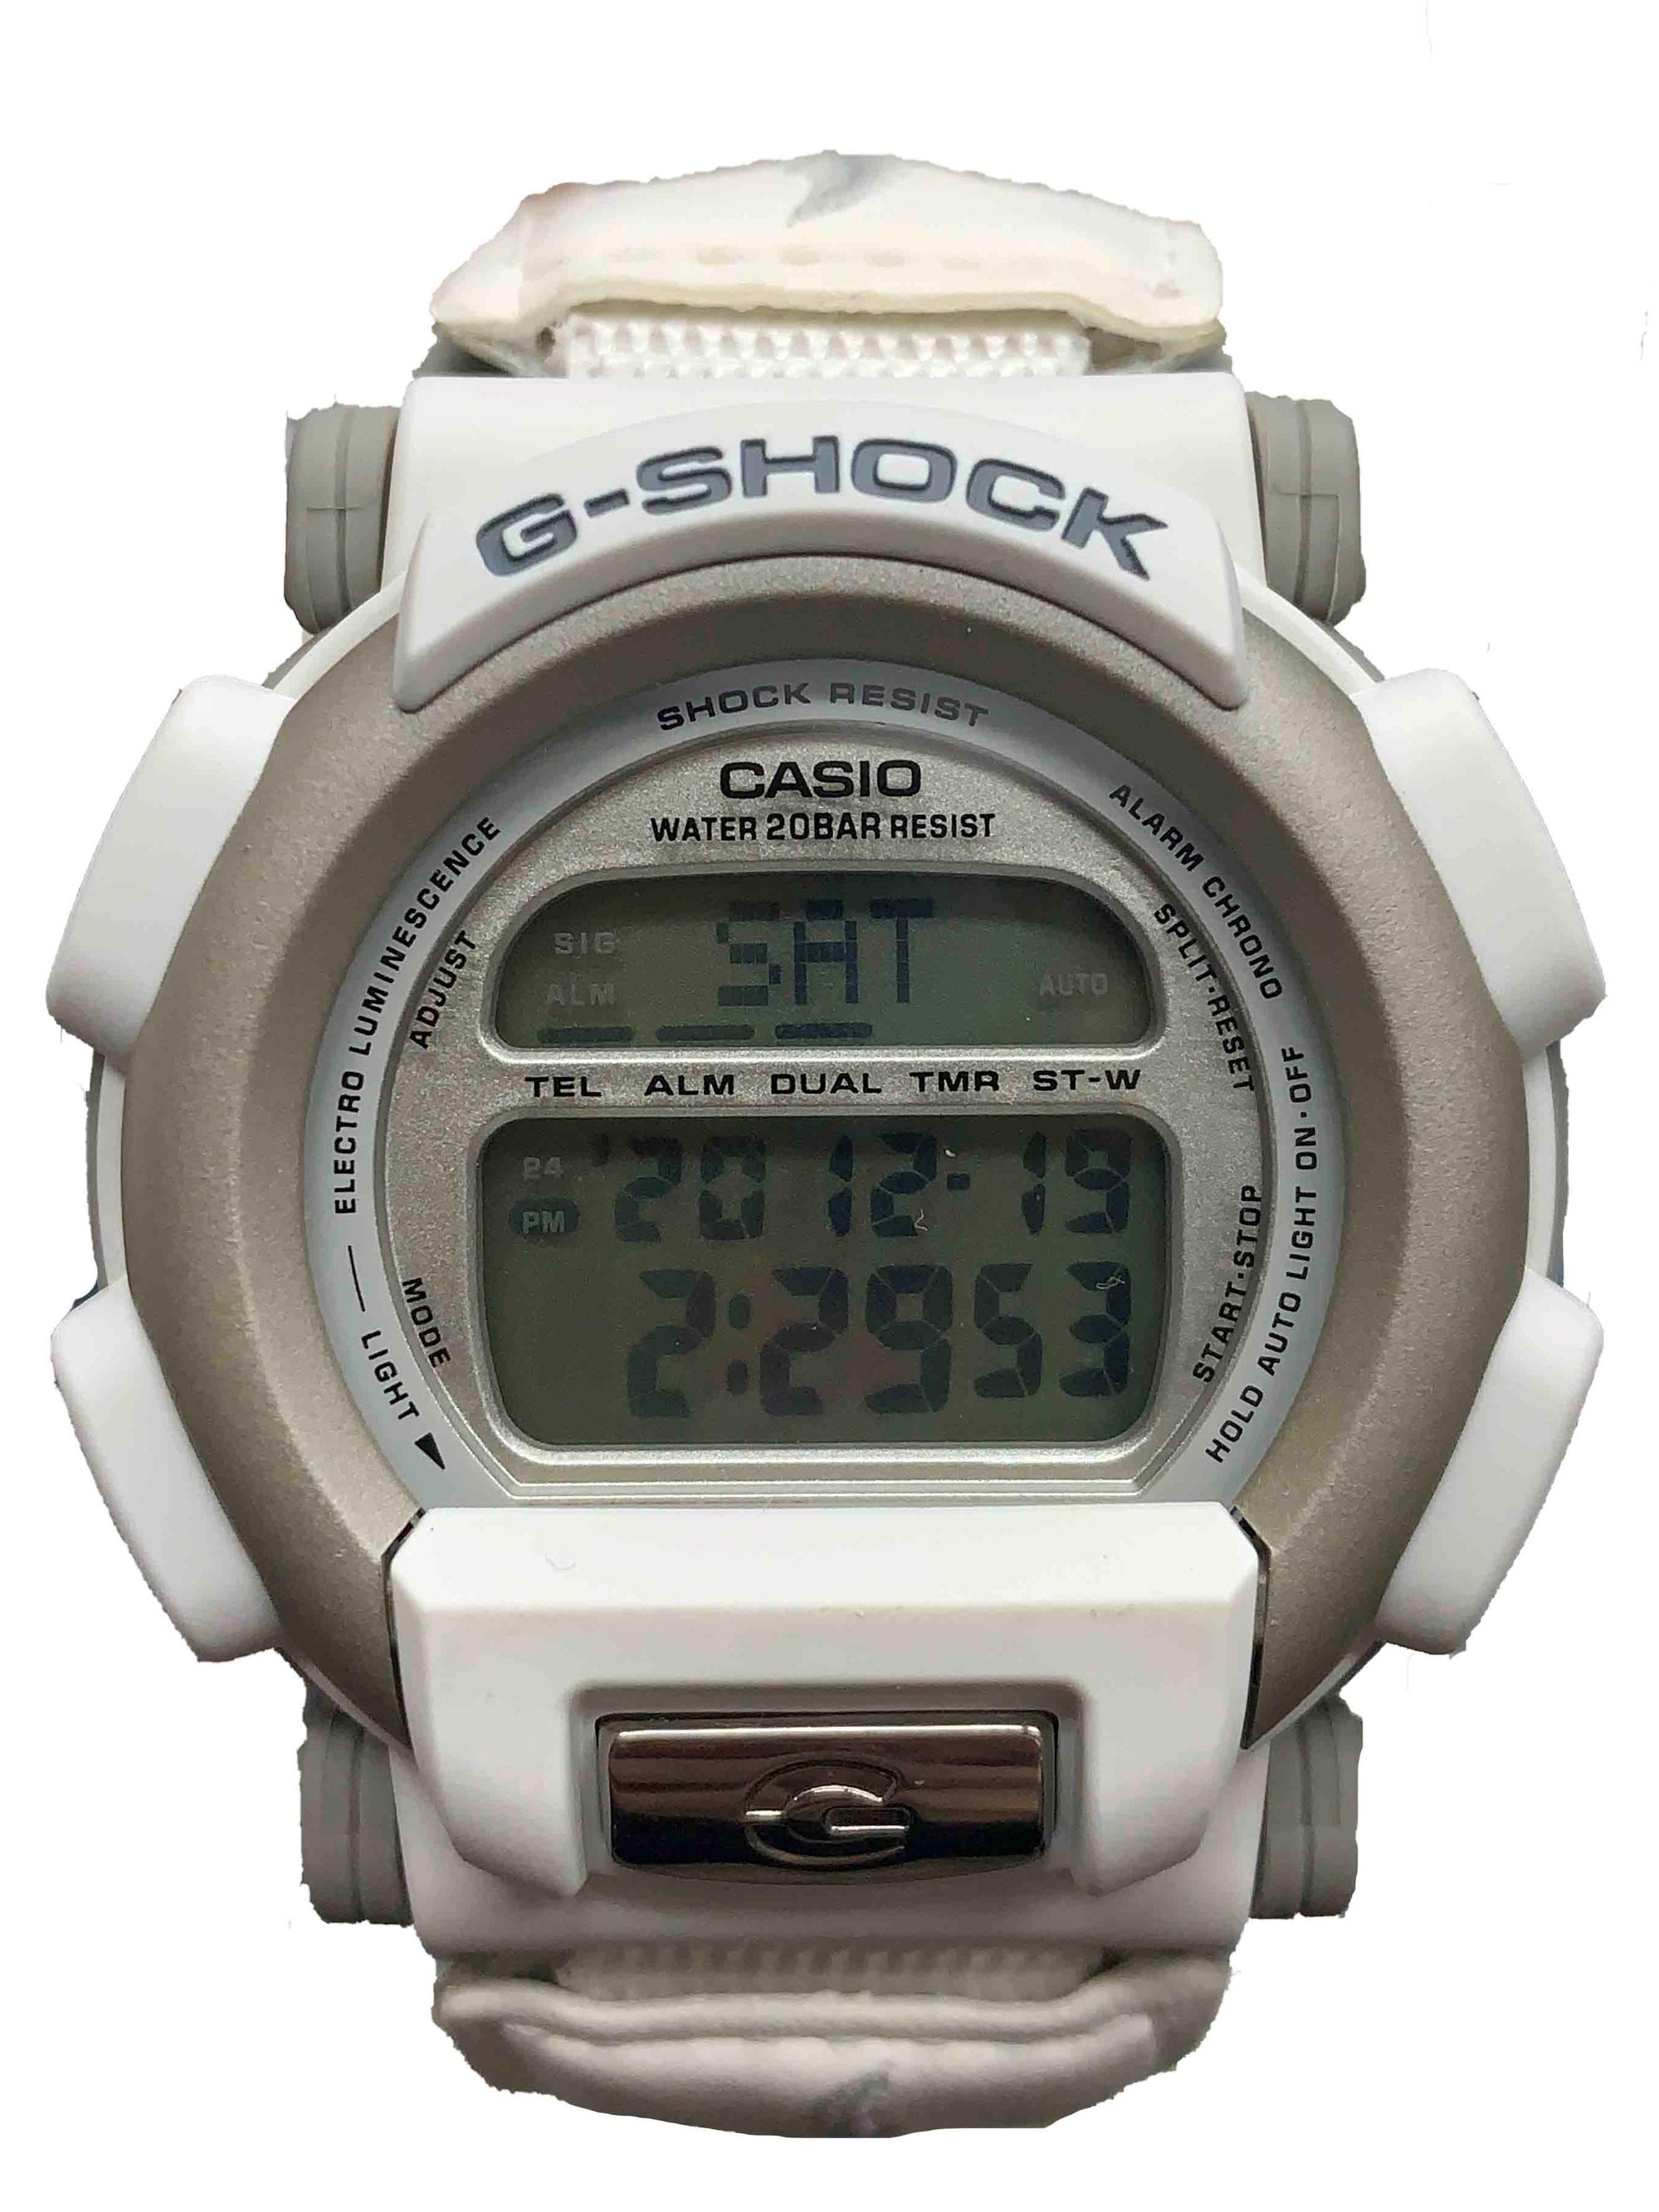 CASIO G-SHOCK 受注生産品 RockNative デットストック商品 1997年11月発売 期間限定送料無料